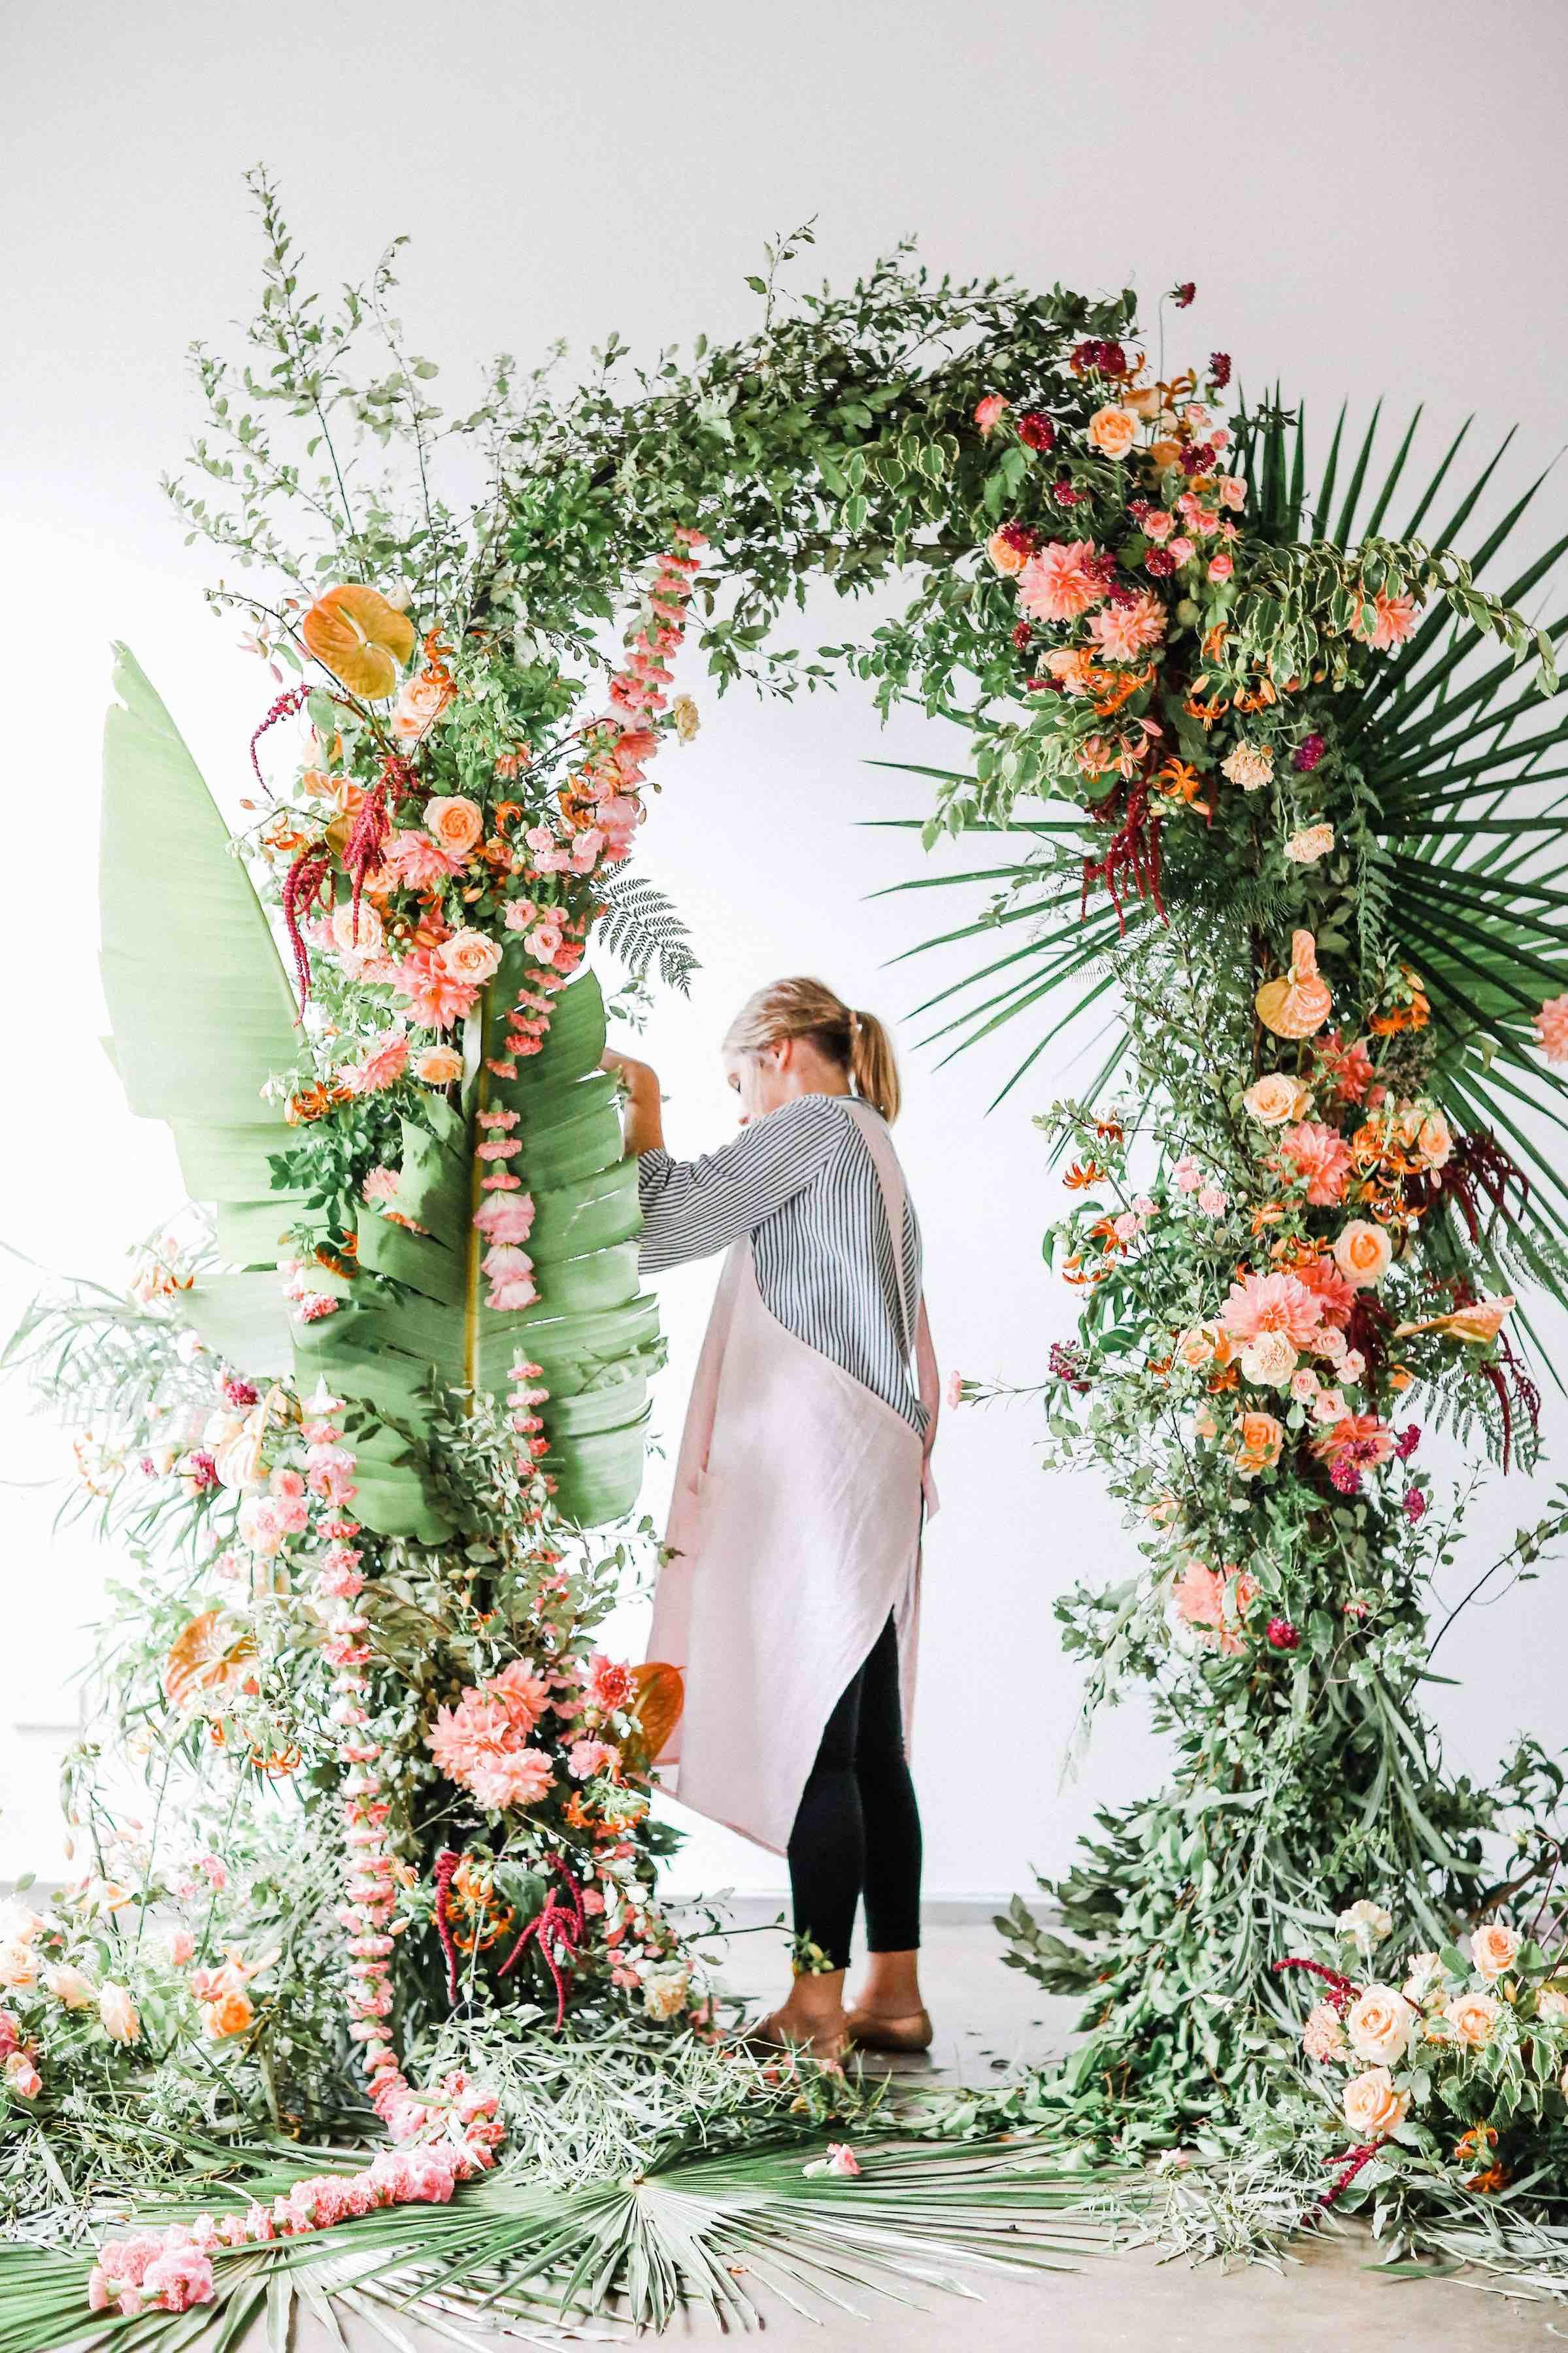 Oh Flora Illume Workshop, Sydney 2018. Image by Lana Ivanova.